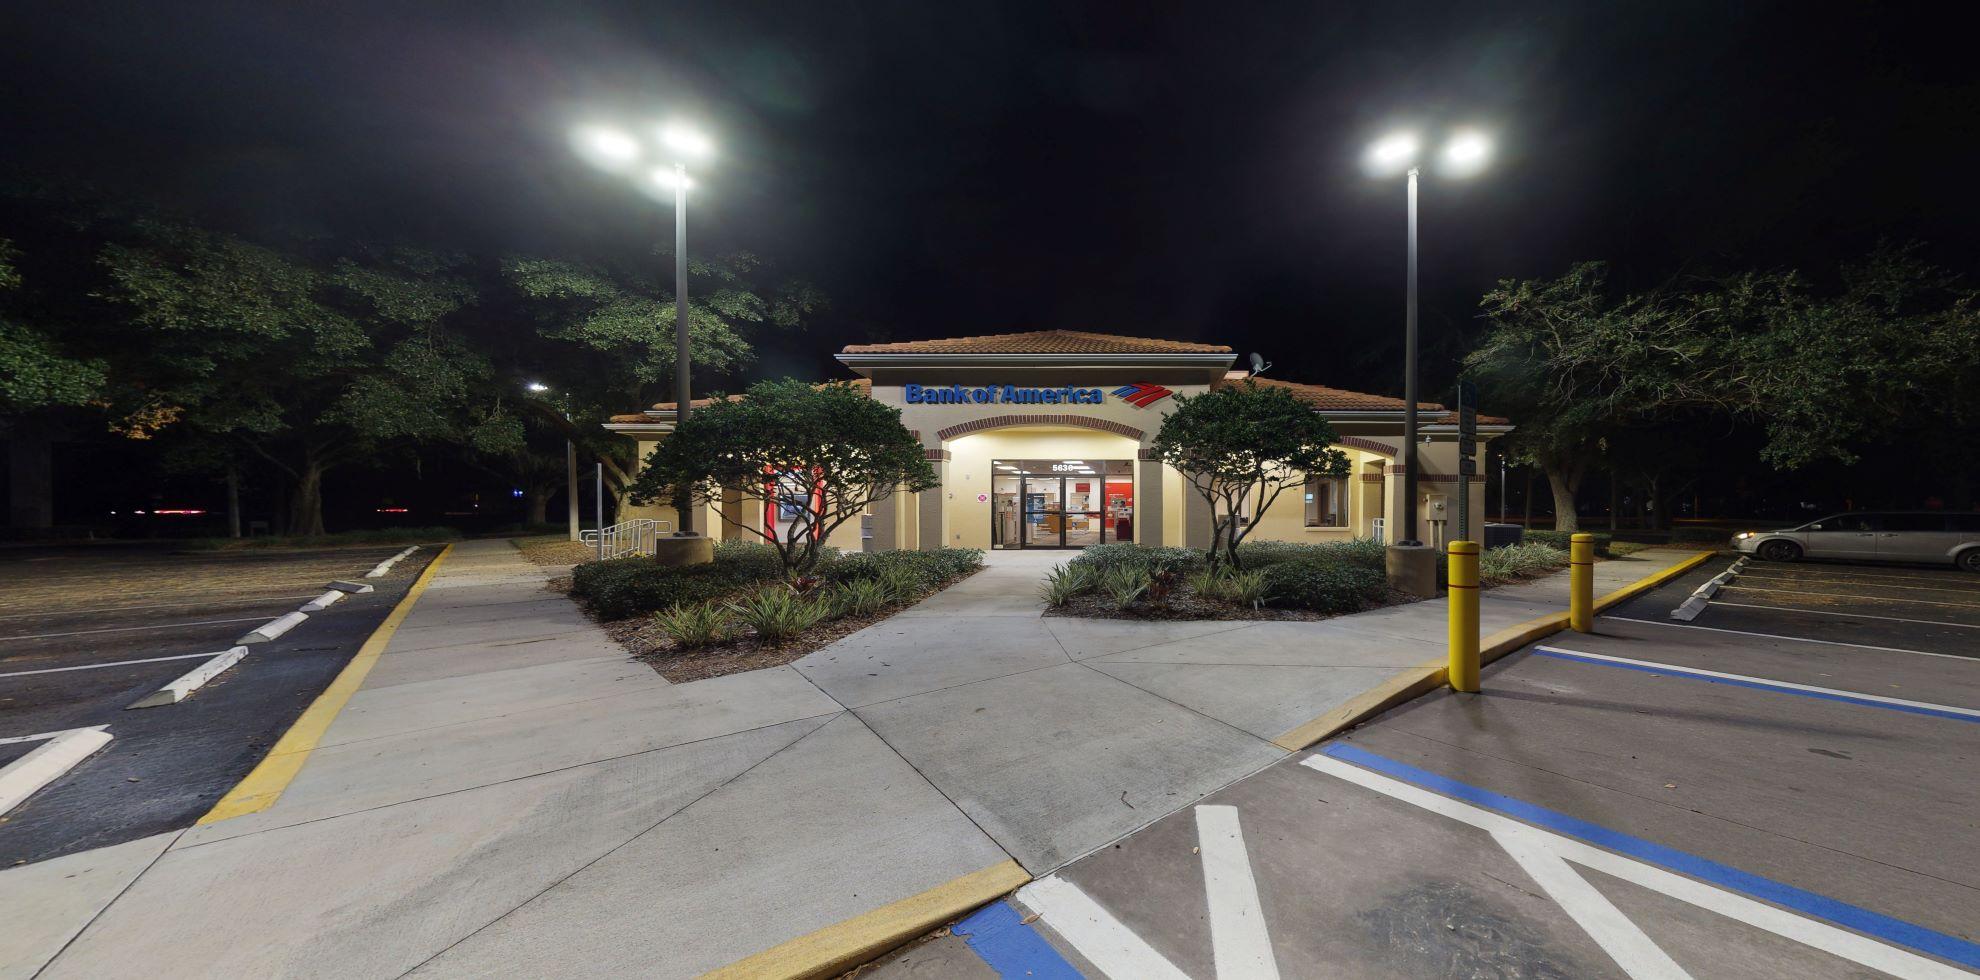 Bank of America financial center with drive-thru ATM   5636 Gunn Hwy, Tampa, FL 33624